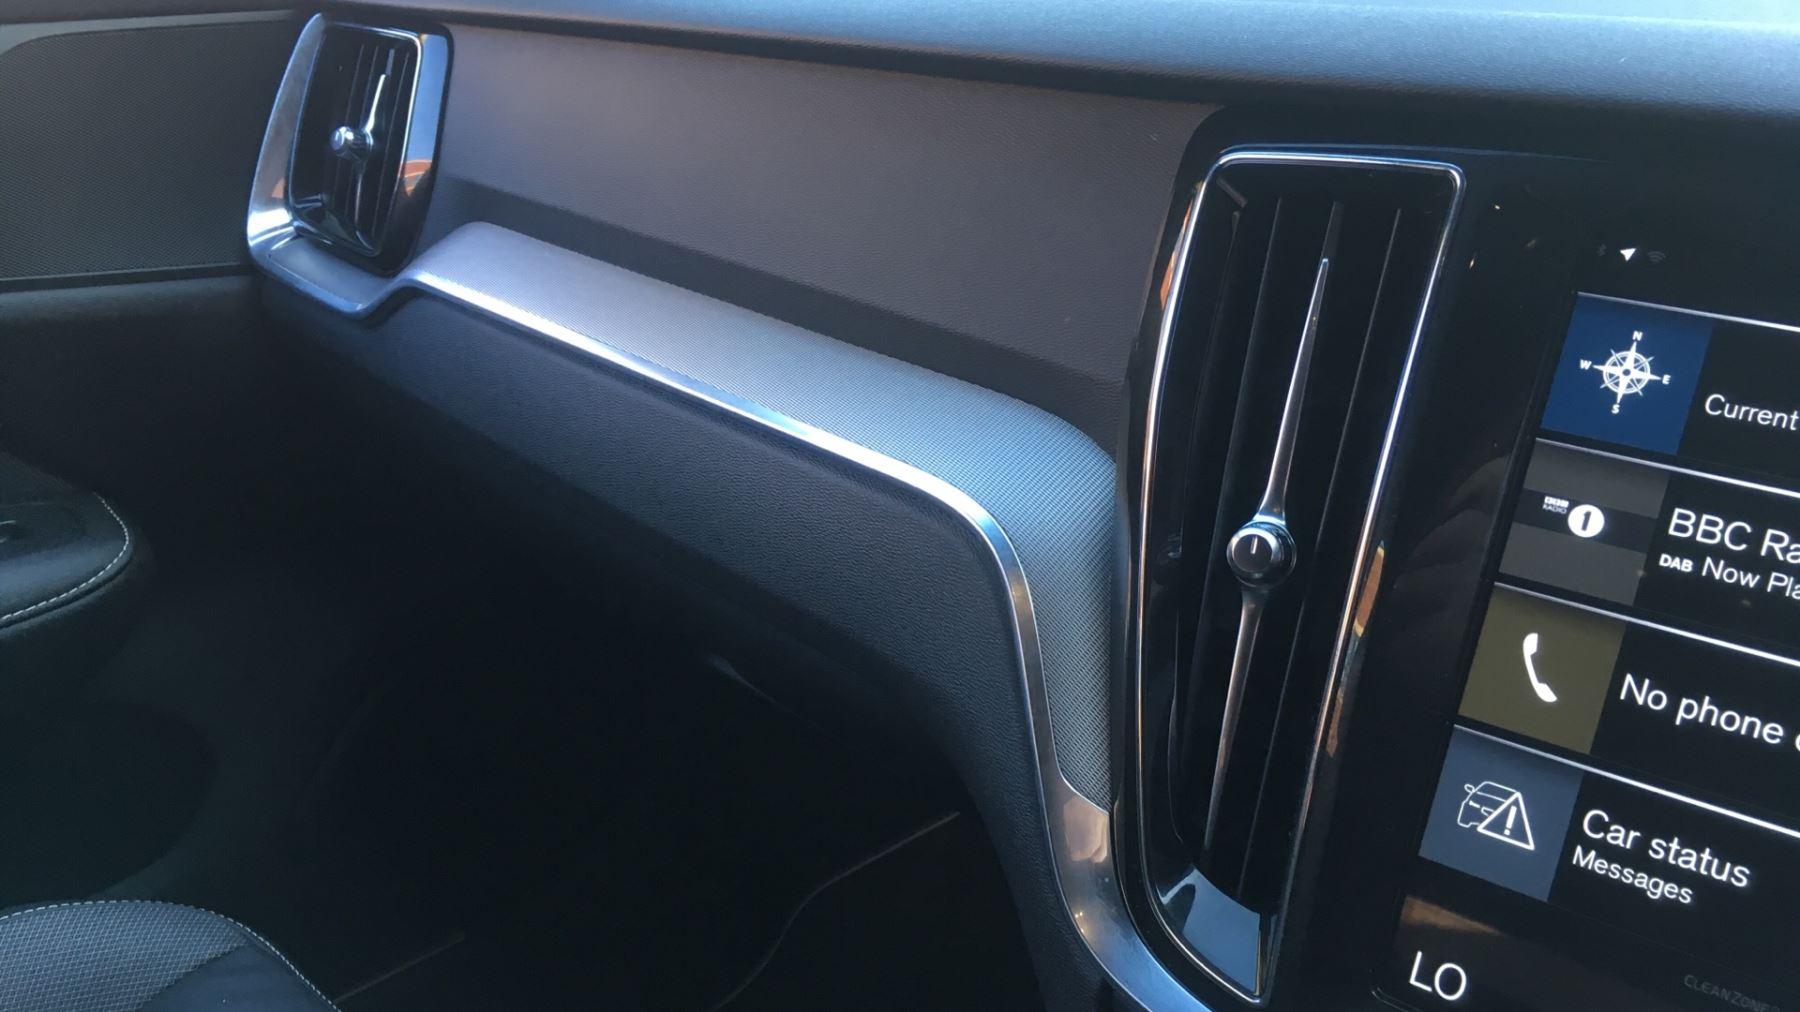 Volvo V60 2.0 D4 [190] R DESIGN 5dr - Volvo on Call, DAB Radio, SAT NAV, Park Assist image 30